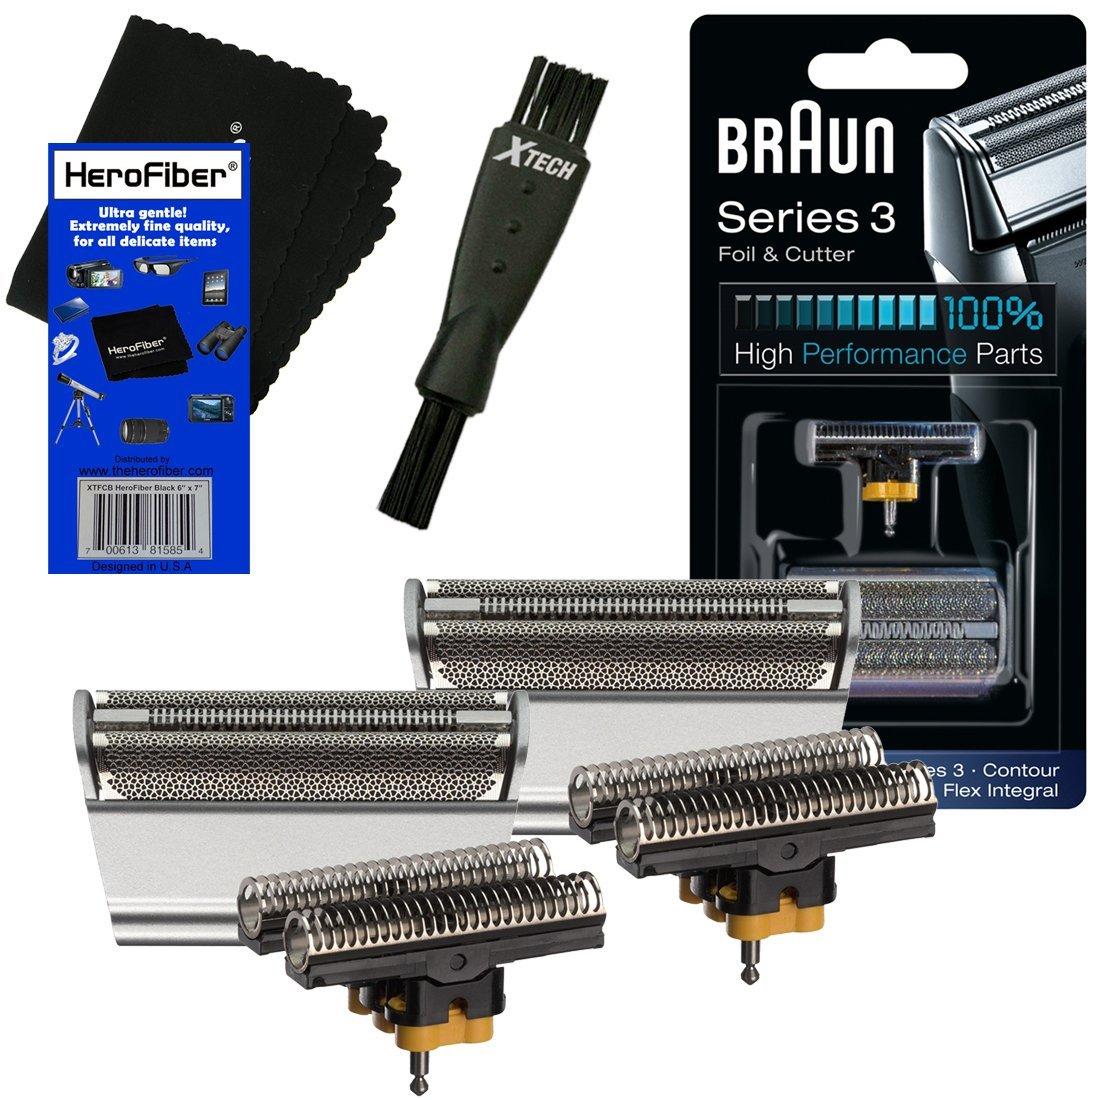 Braun Combi 31S Foil & Cutter Replacement Set, silver (2 pack) for Select Series 3, Contour, Flex XP, Flex integral (5000/6000) Shavers + Double Ended Shaver Brush + HeroFiber Gentle Cleaning Cloth